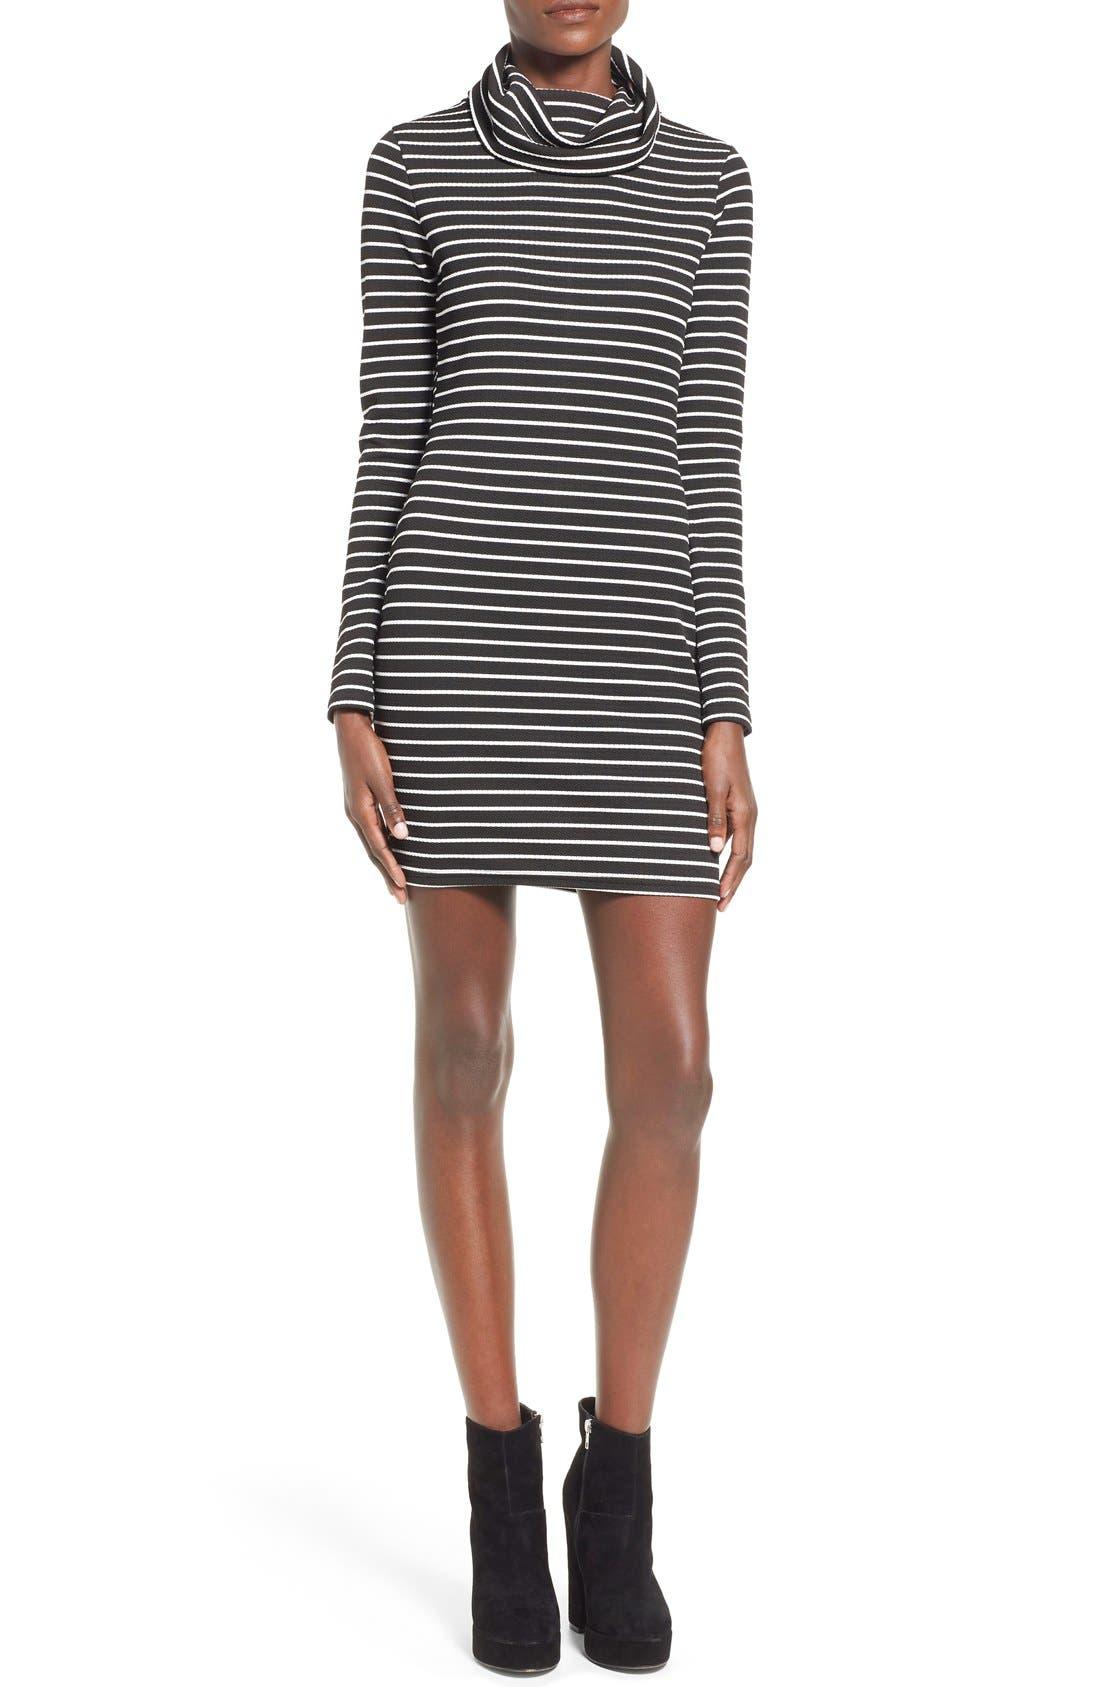 Alternate Image 1 Selected - Missguided Stripe Turtleneck Body-Con Dress